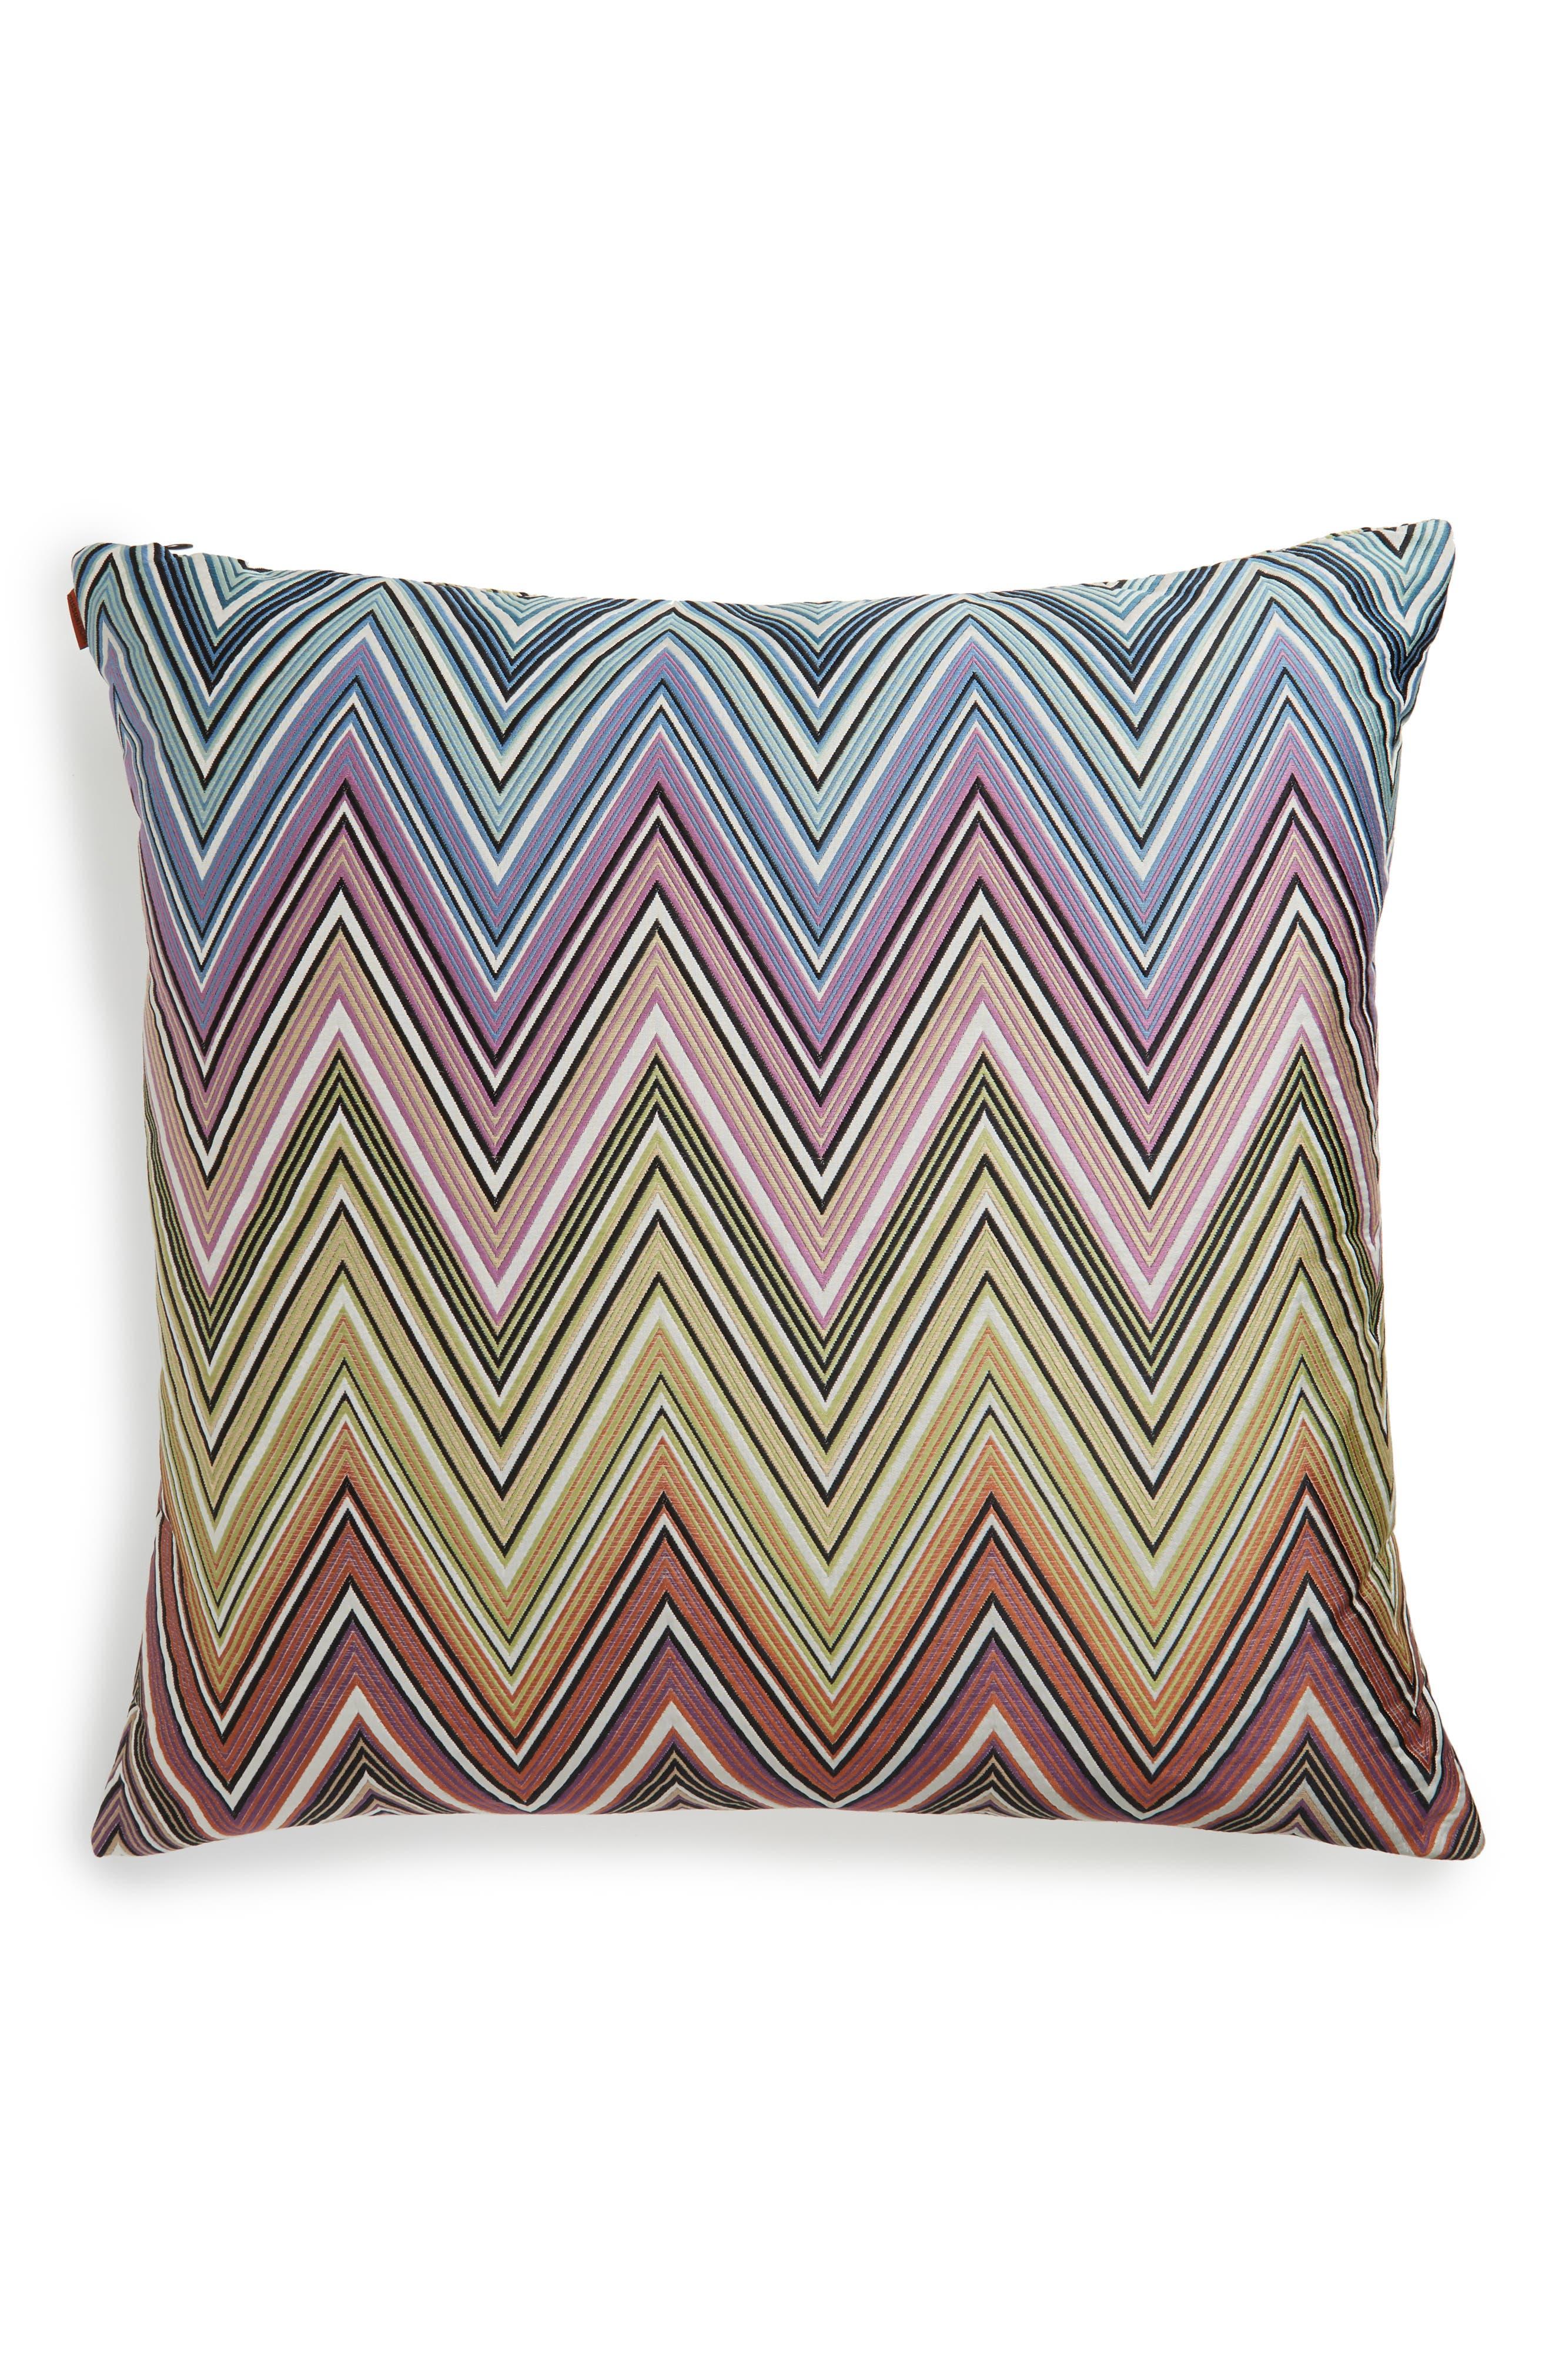 Kew Accent Pillow,                             Main thumbnail 1, color,